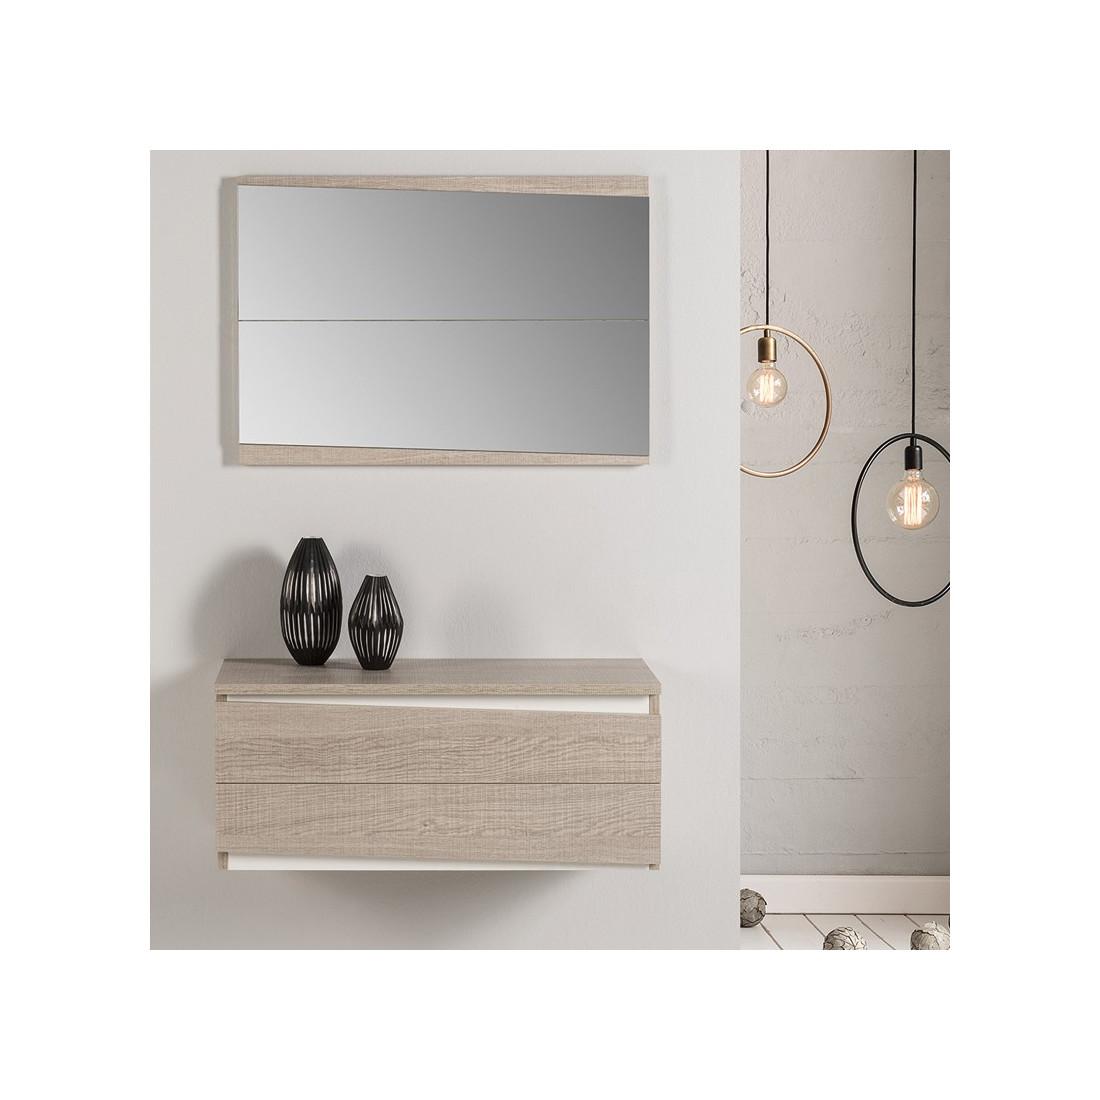 meuble d 39 entr e tiroirs ch ne clair berliose univers. Black Bedroom Furniture Sets. Home Design Ideas